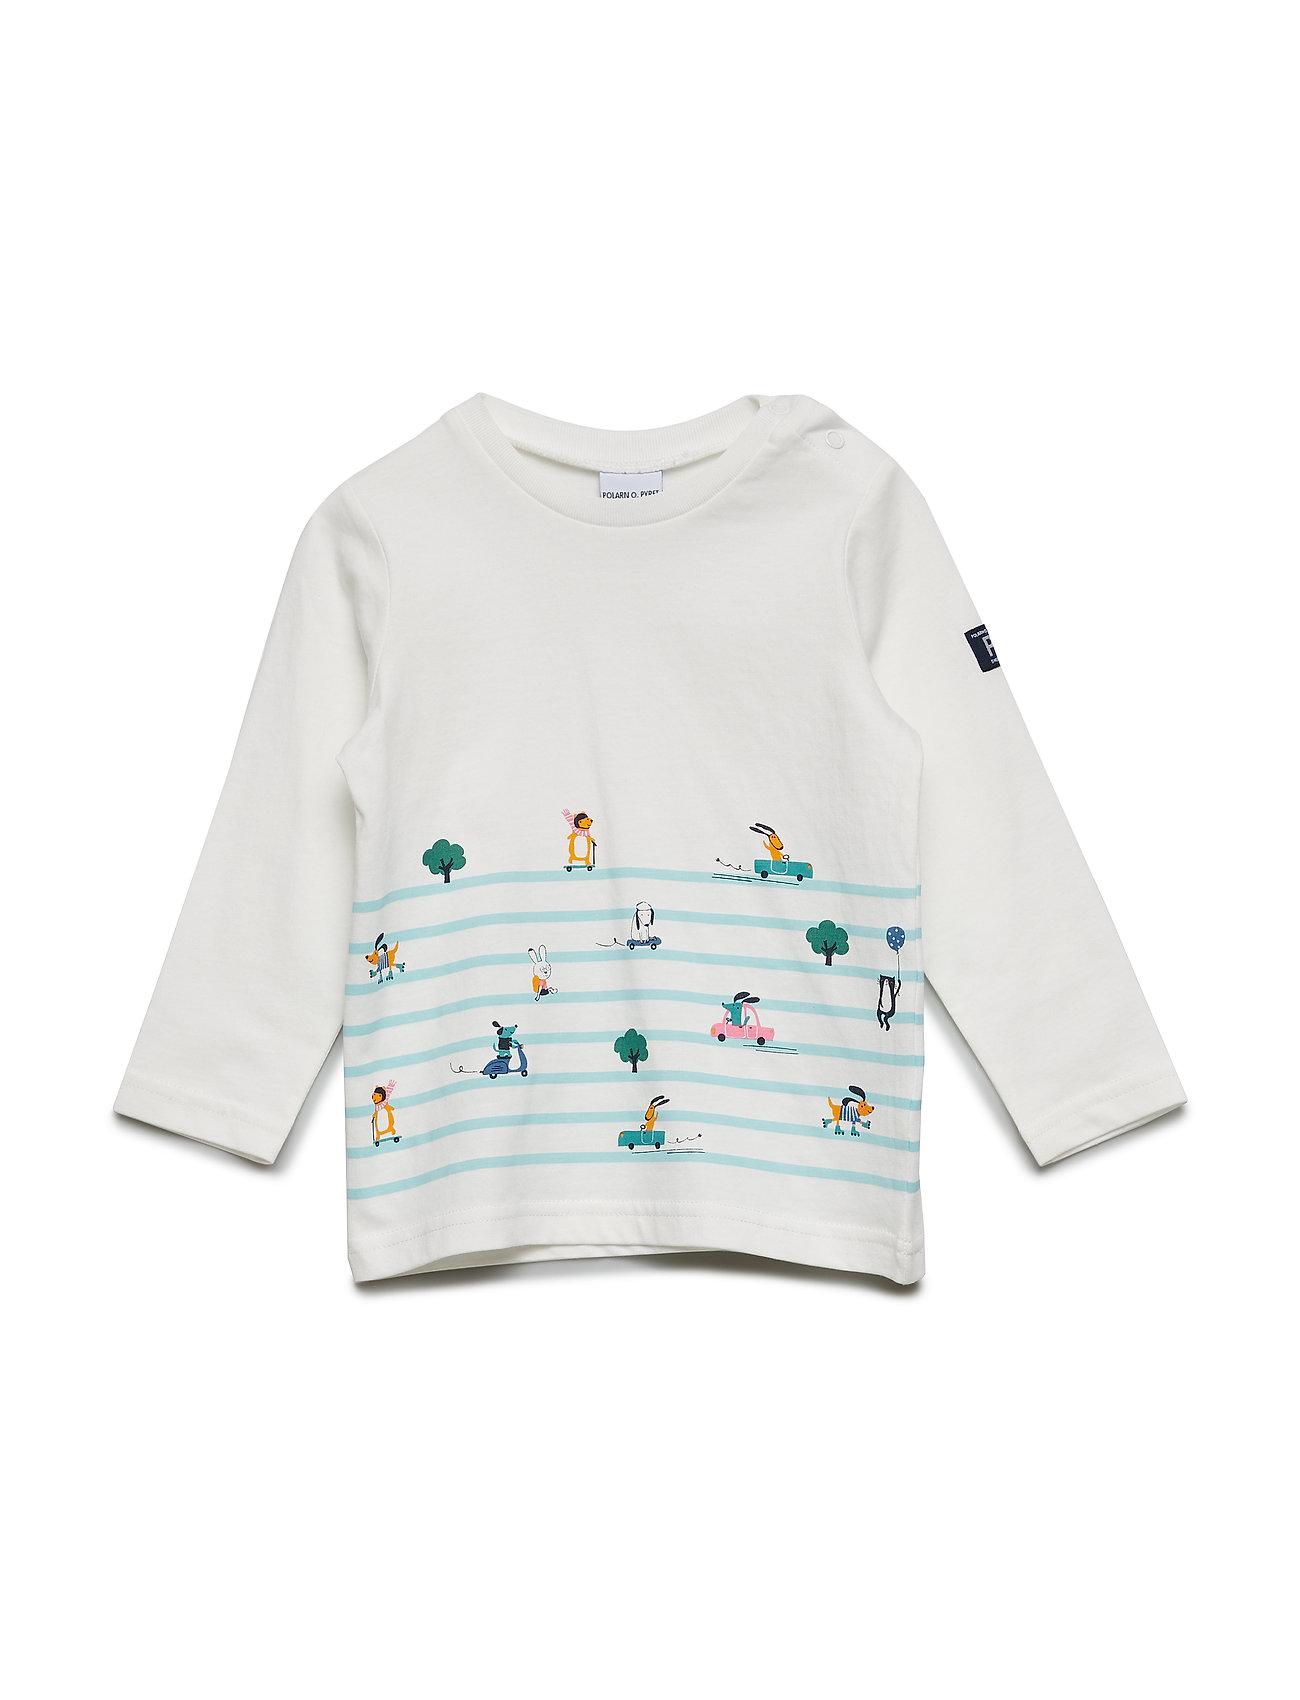 Polarn O. Pyret T-shirt print Preschool